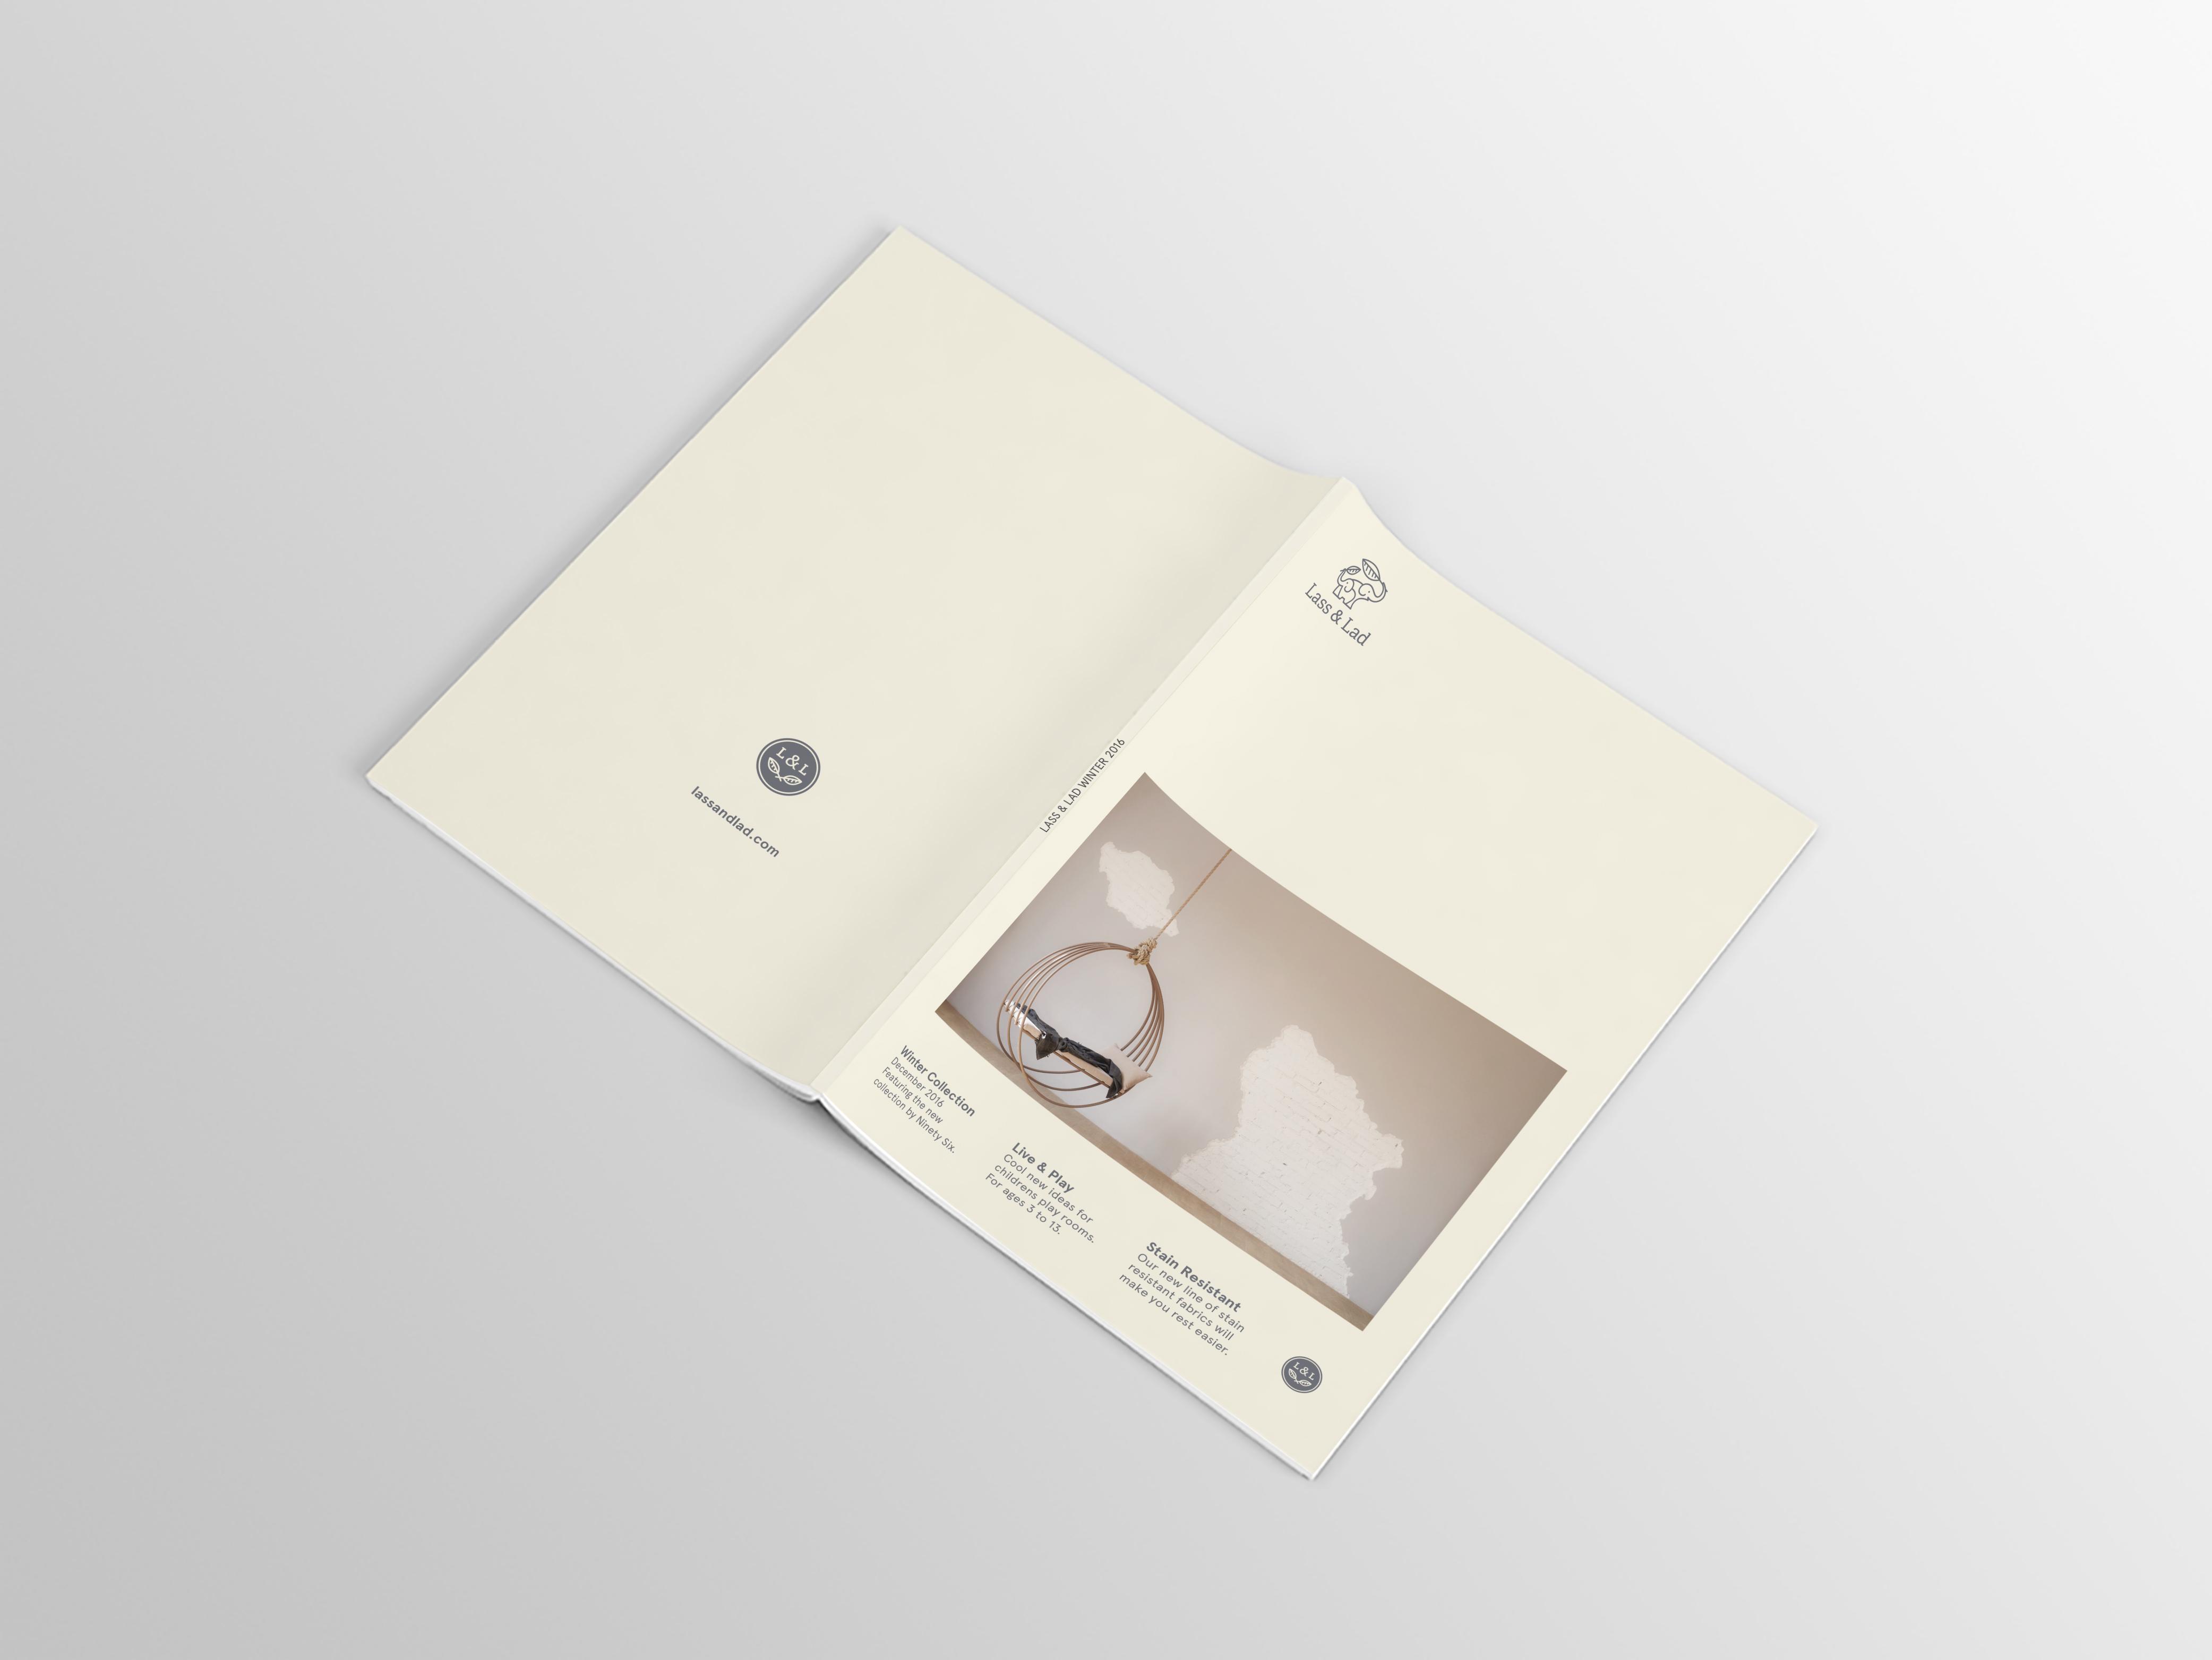 Lass & Lad product magazine